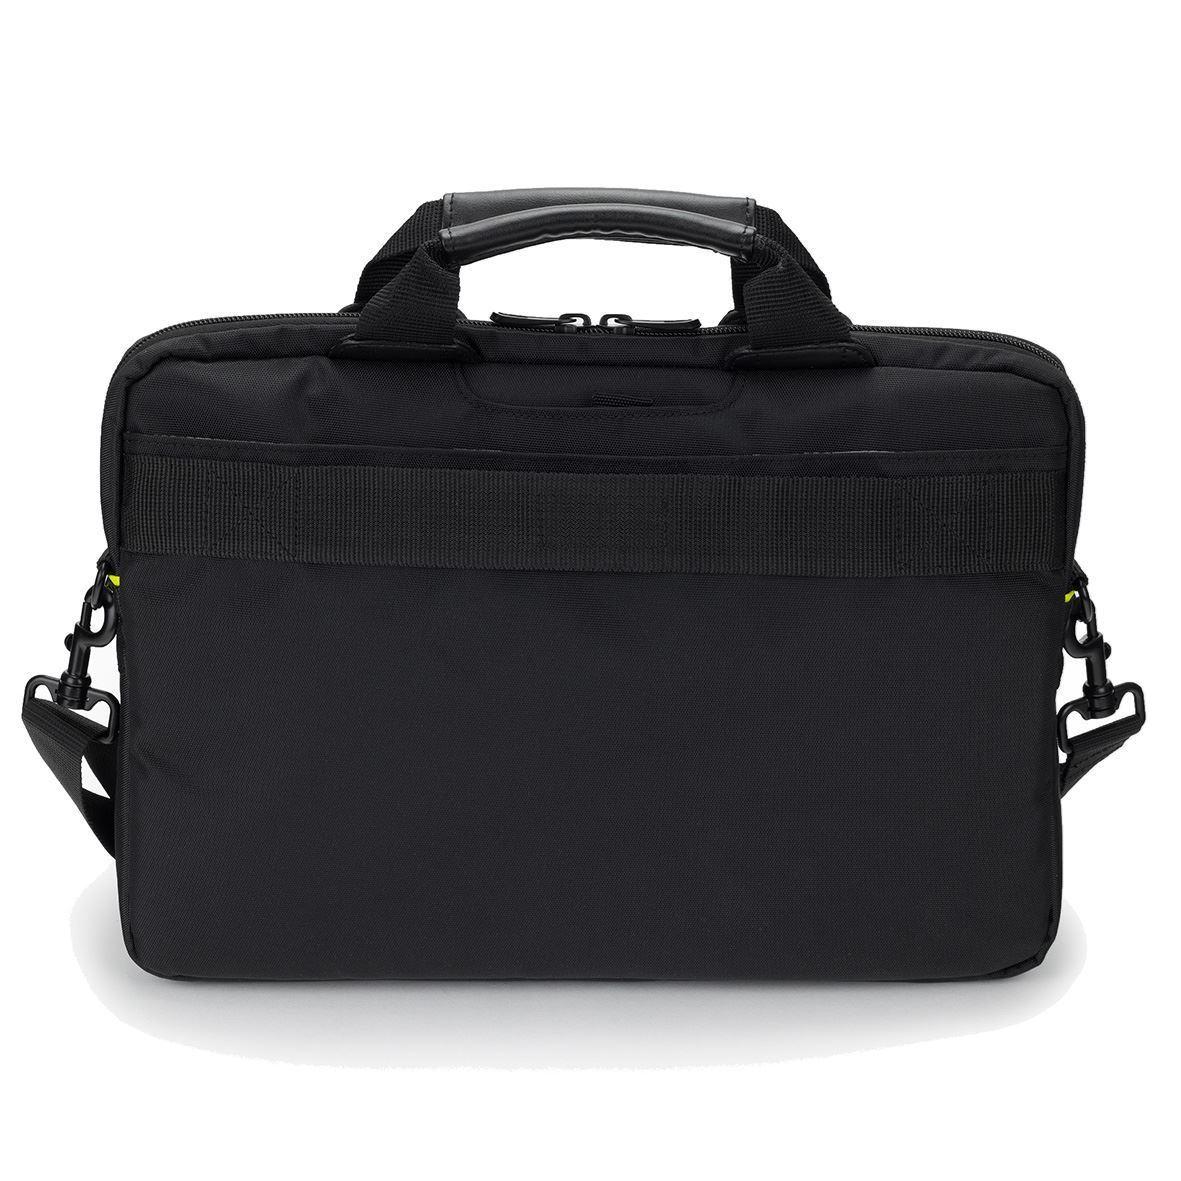 "Picture of CityGear 11.6-12"" Slim Topload Laptop Case - Black"